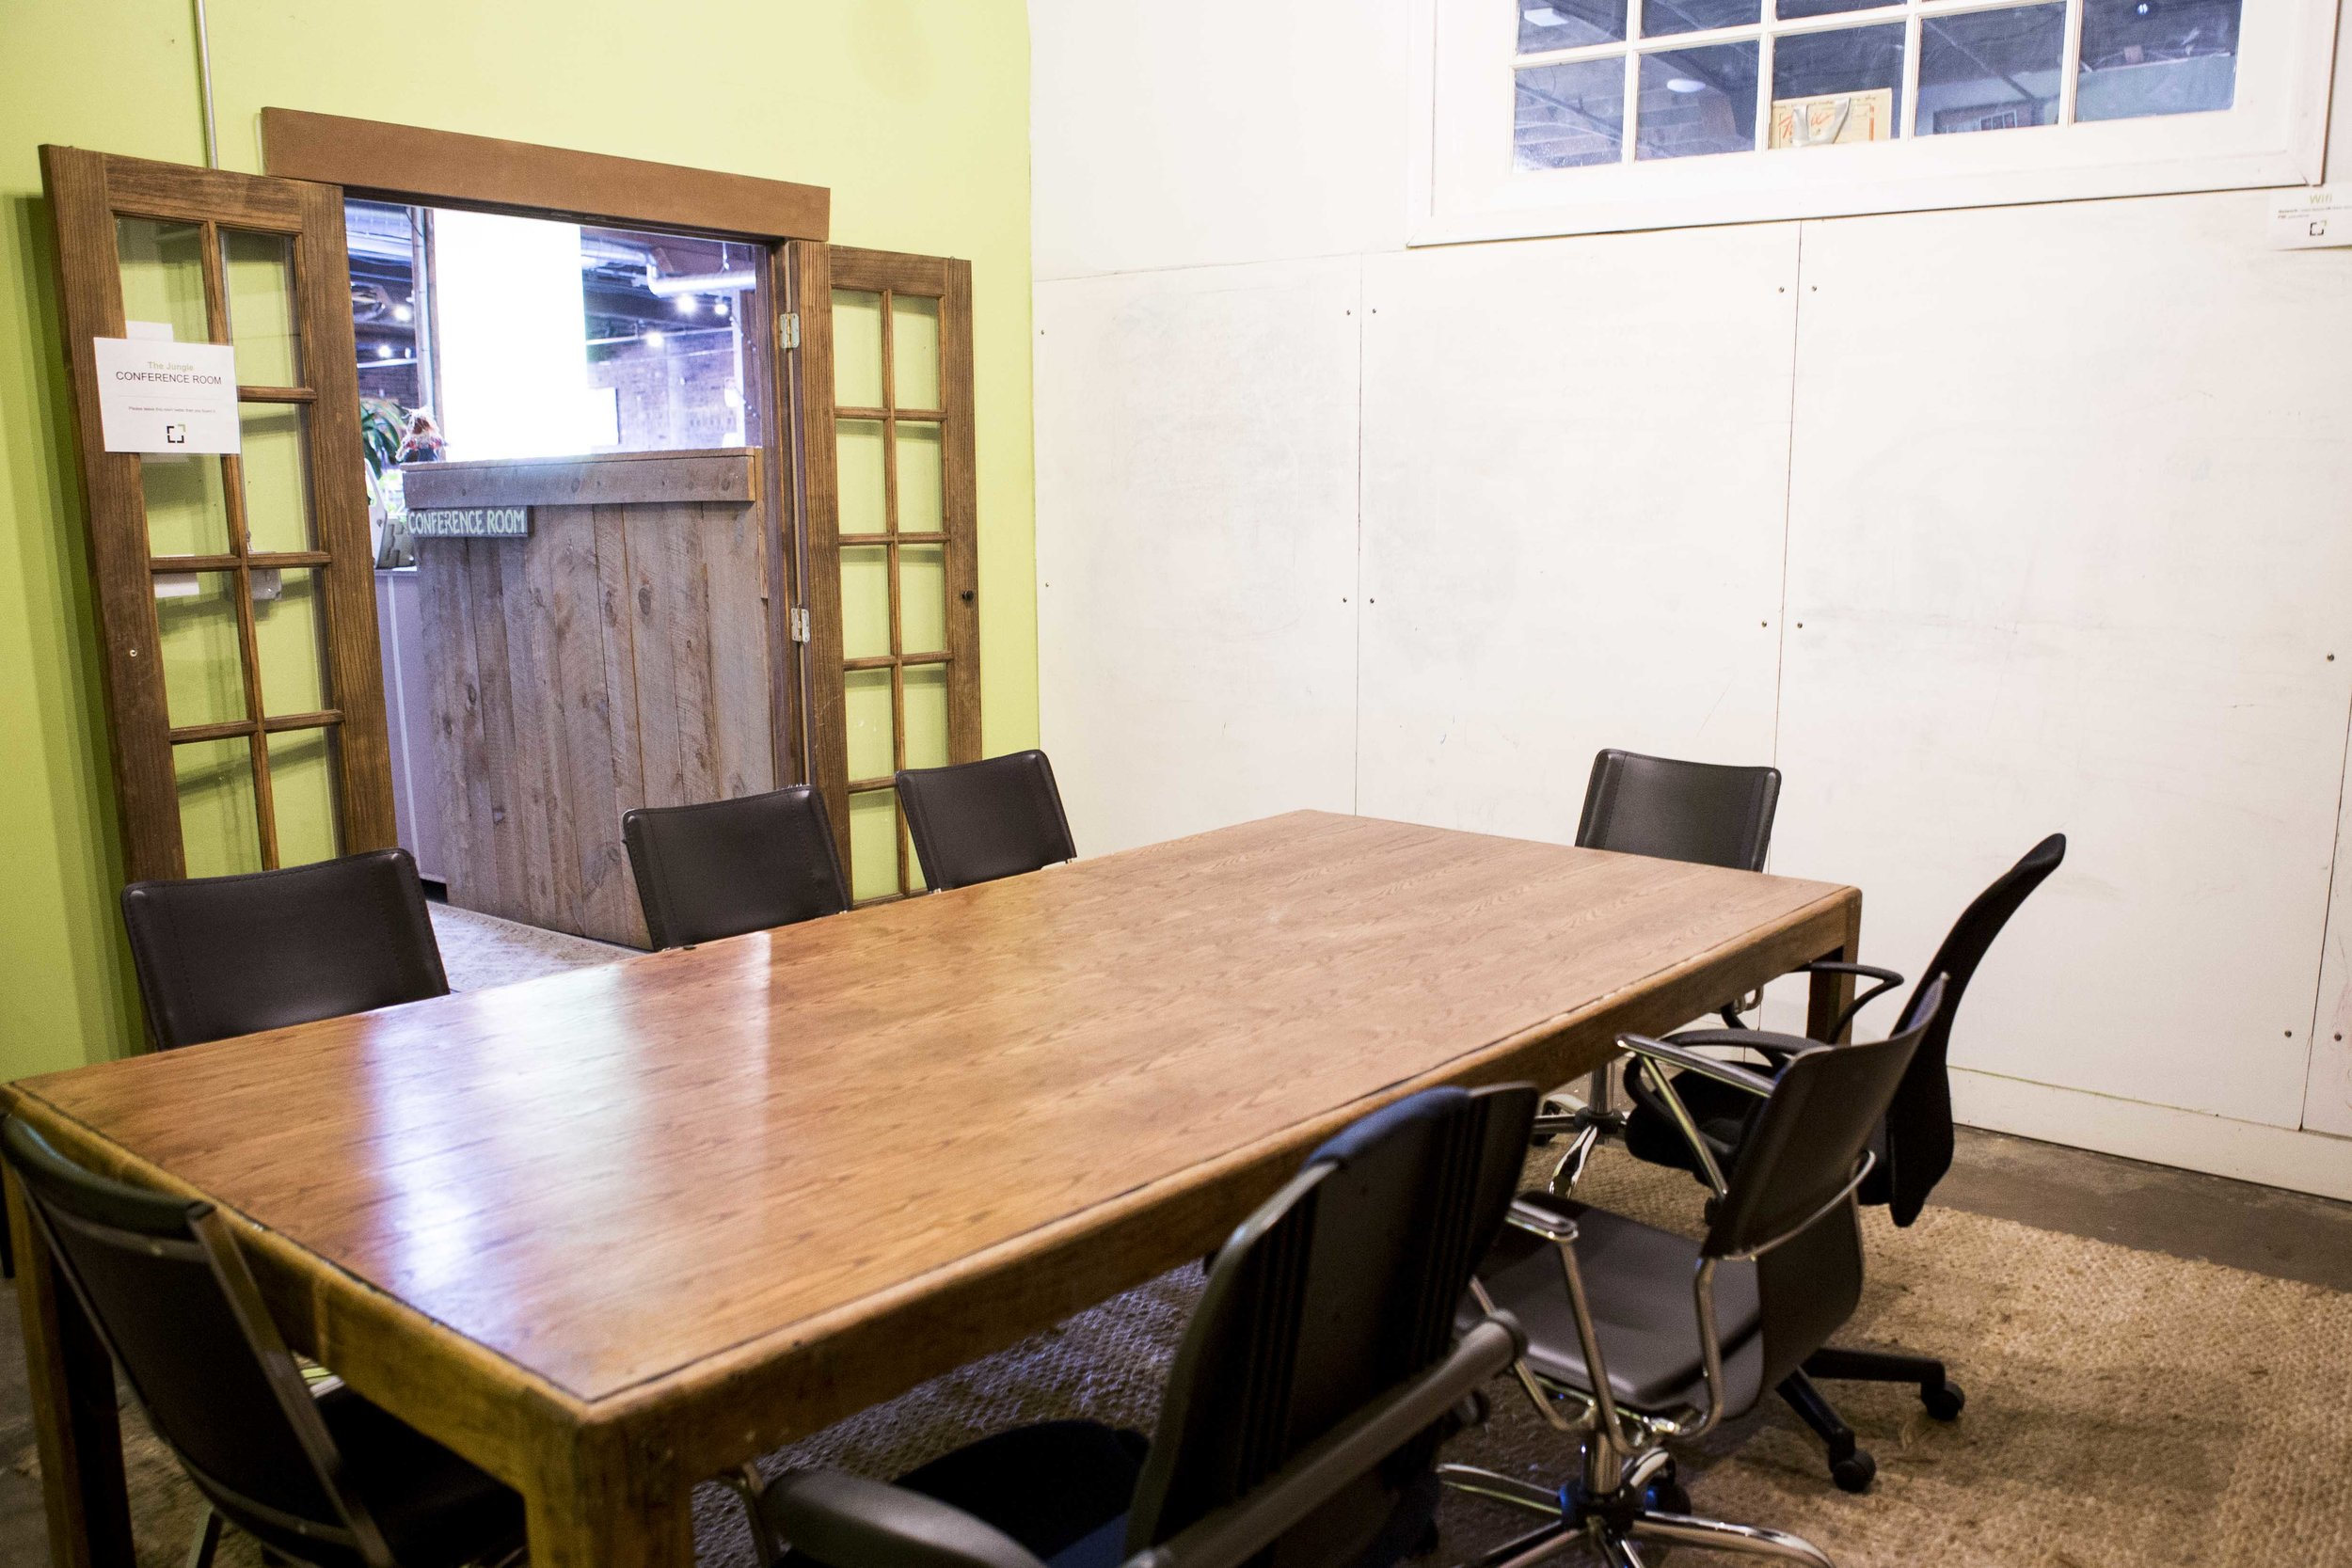 GreenSpaces-Jungle-Conference-Room-APIELA-40.JPG